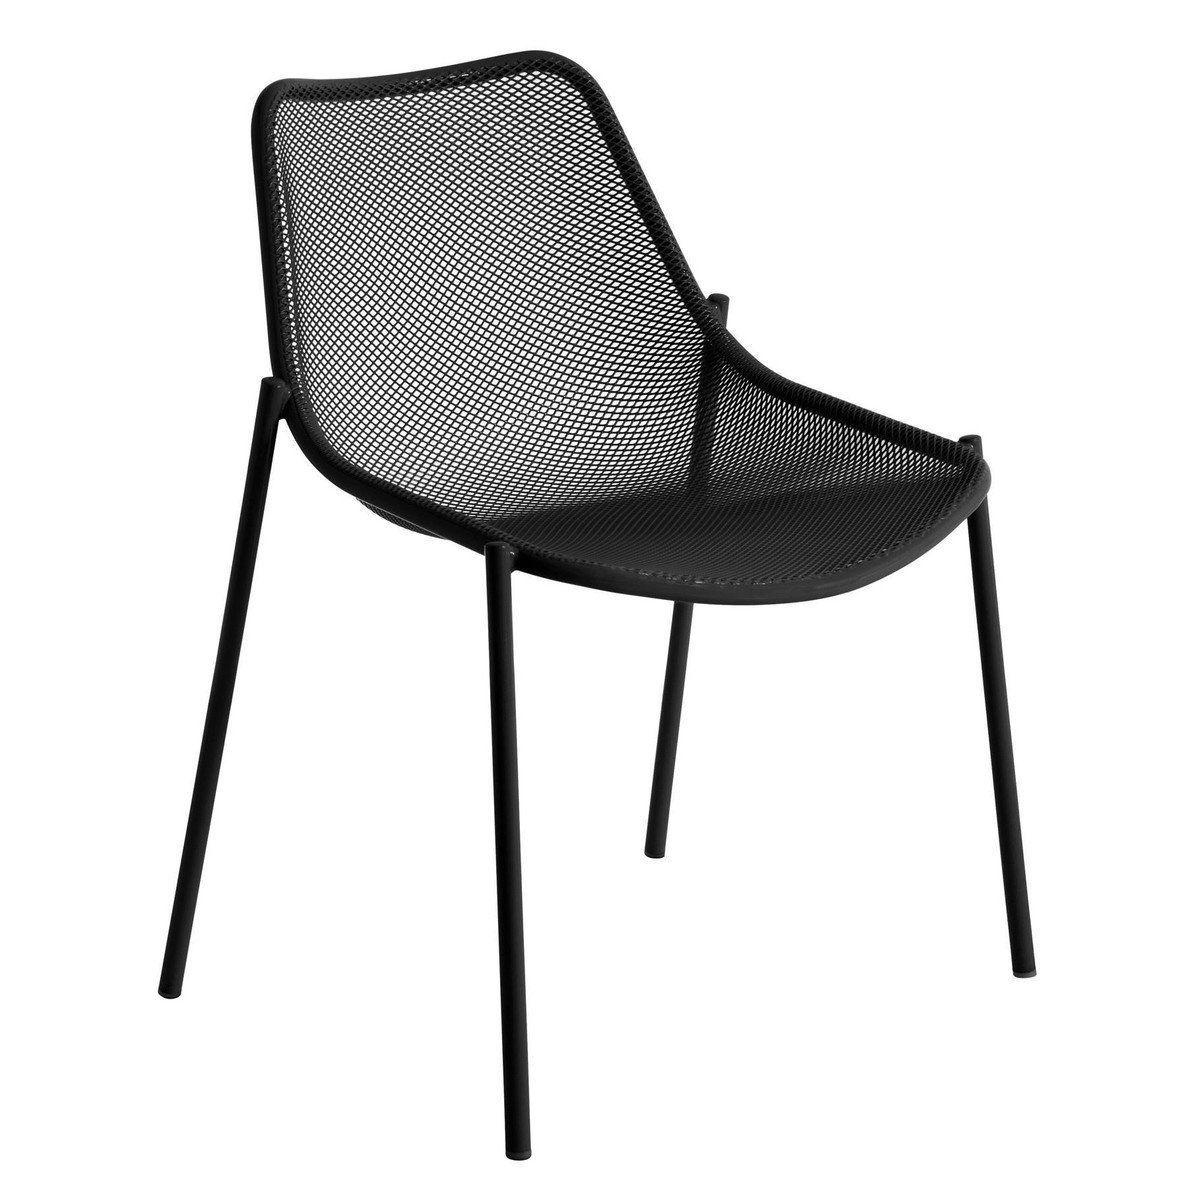 Round Silla De Jard N Emu Ambientedirect Com # Muebles Bauhaus Caracteristicas